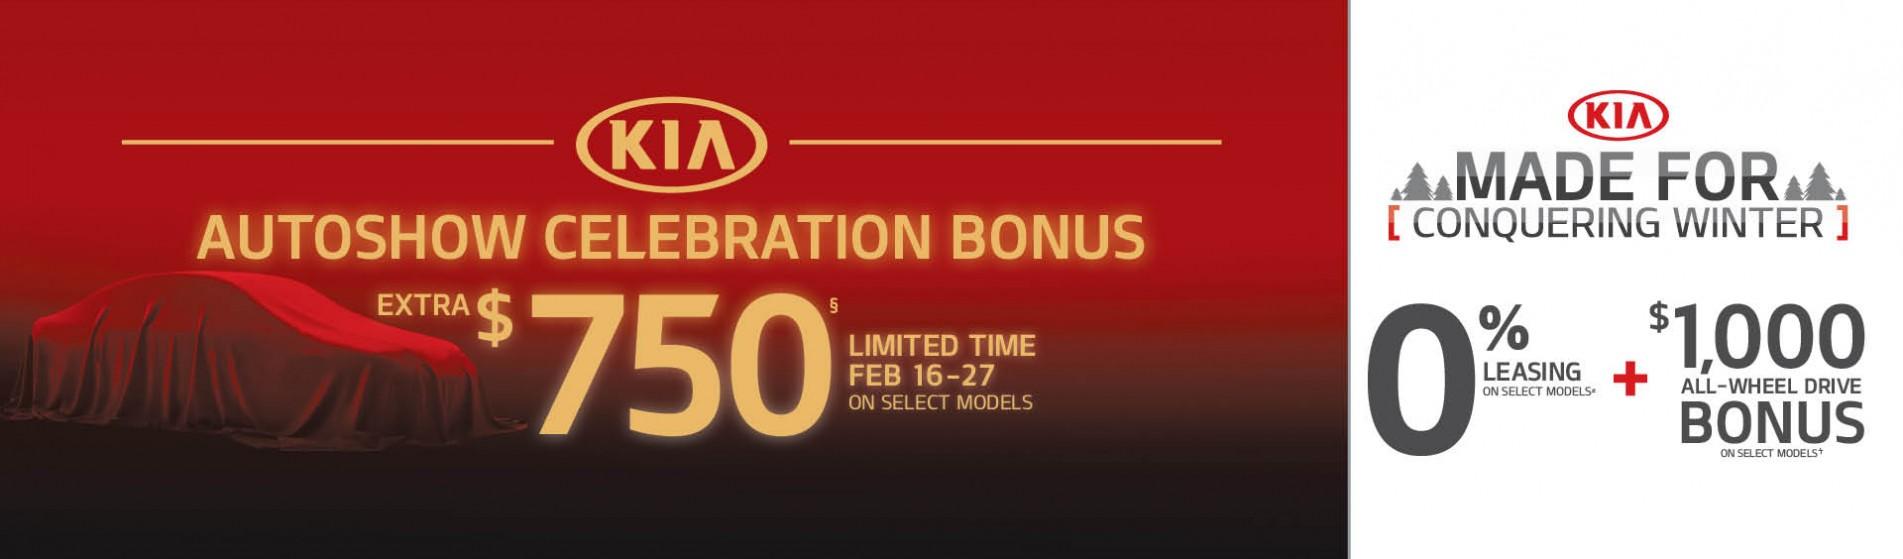 Kia Auto Show Celebration Bonus